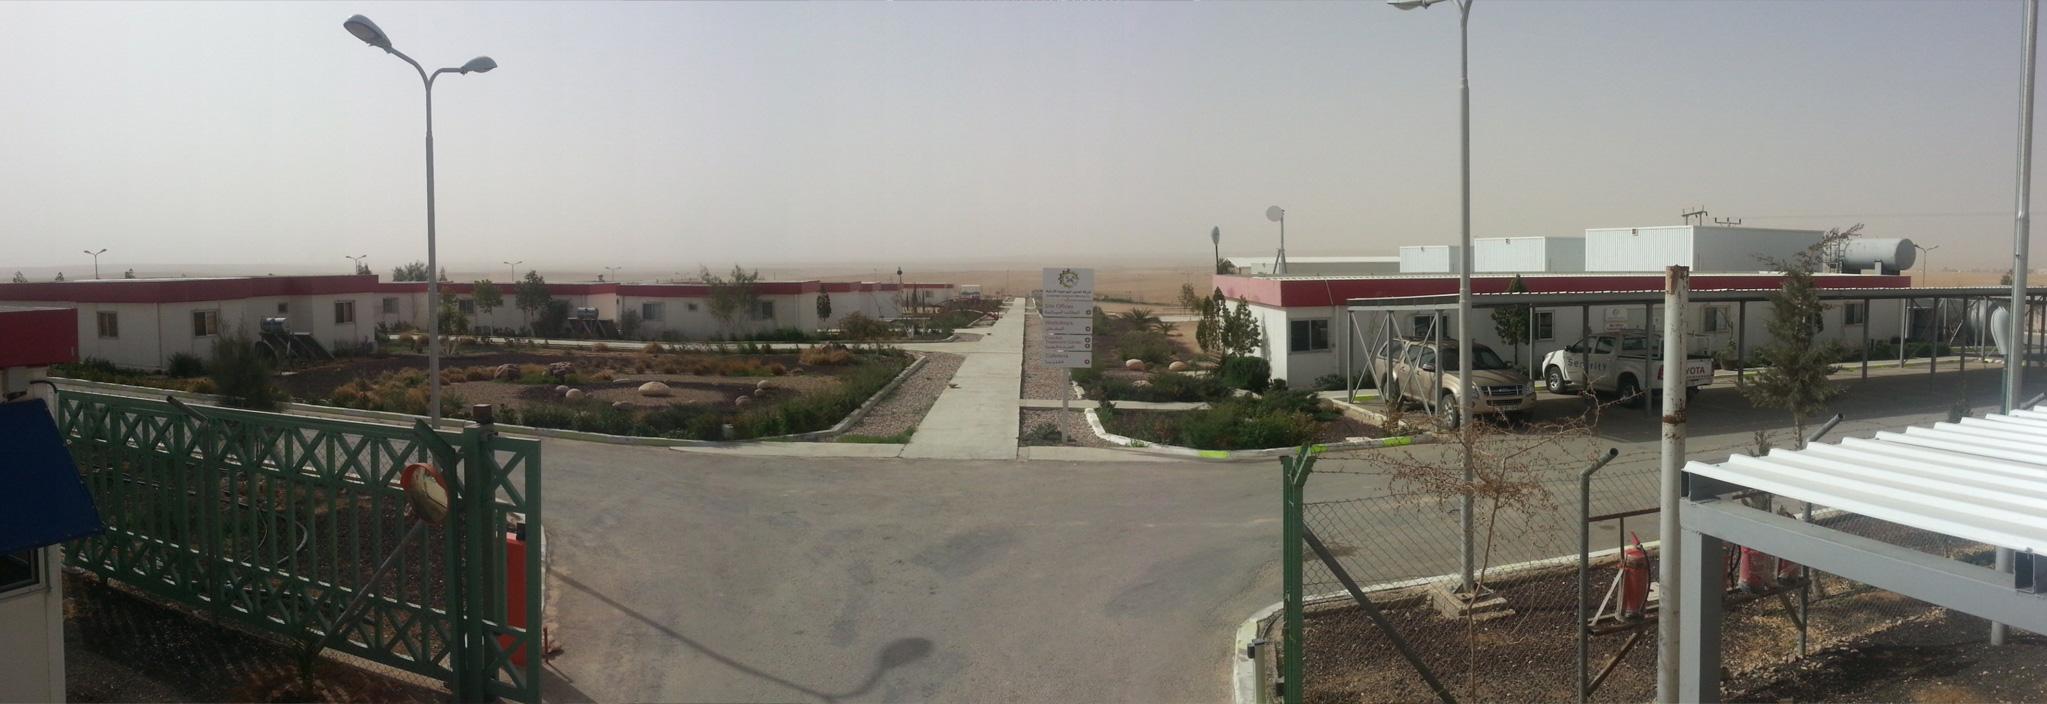 Jordanian Uranium Mining Company